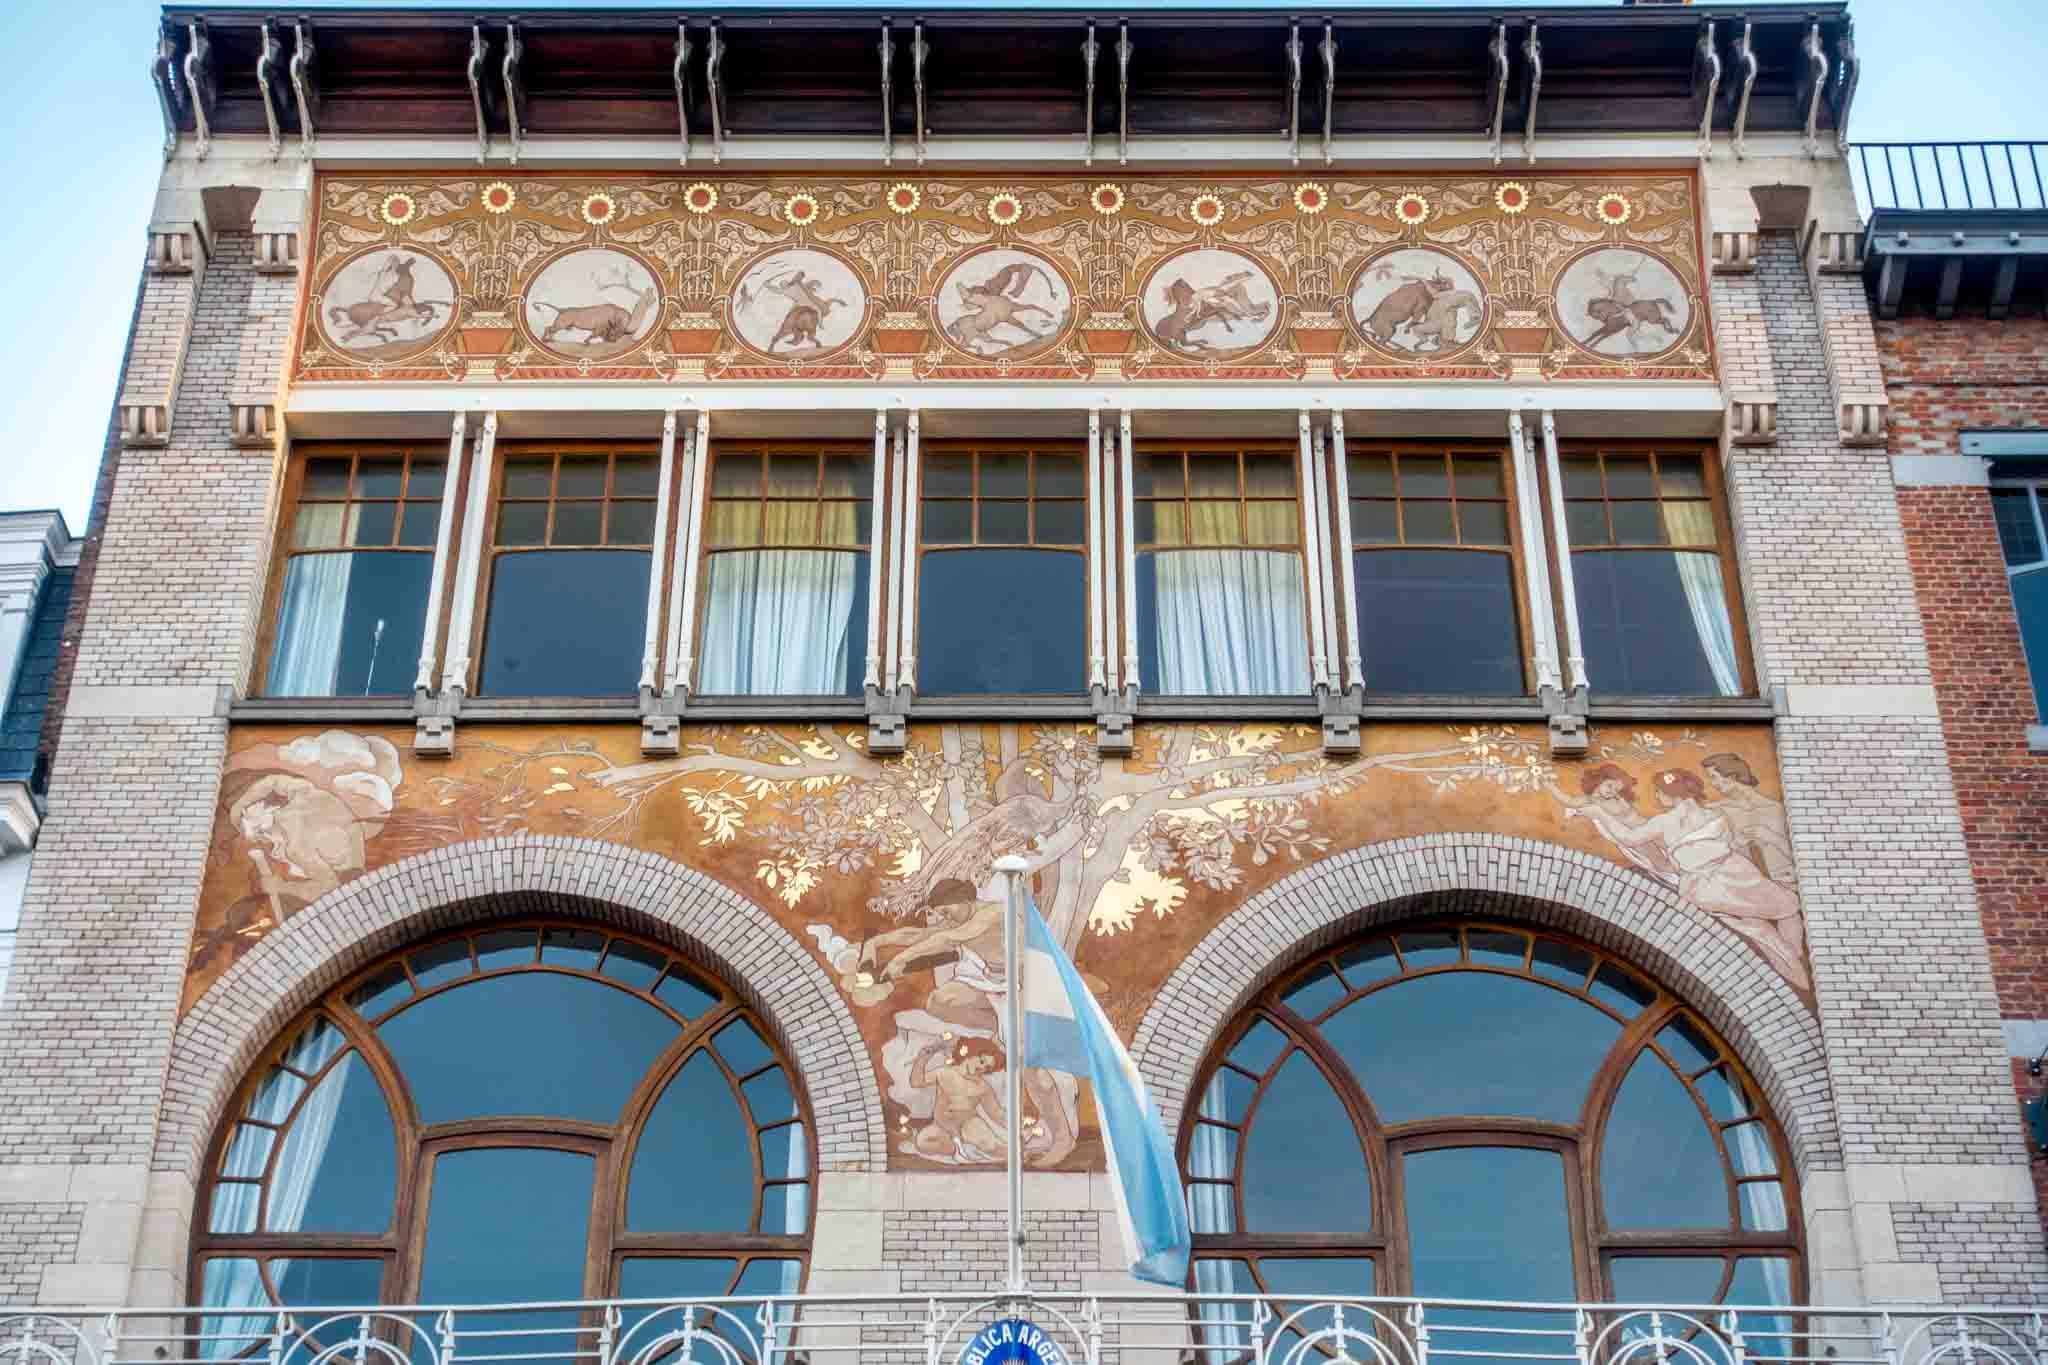 Art Nouveau building with circular windows and graphic tiled facade